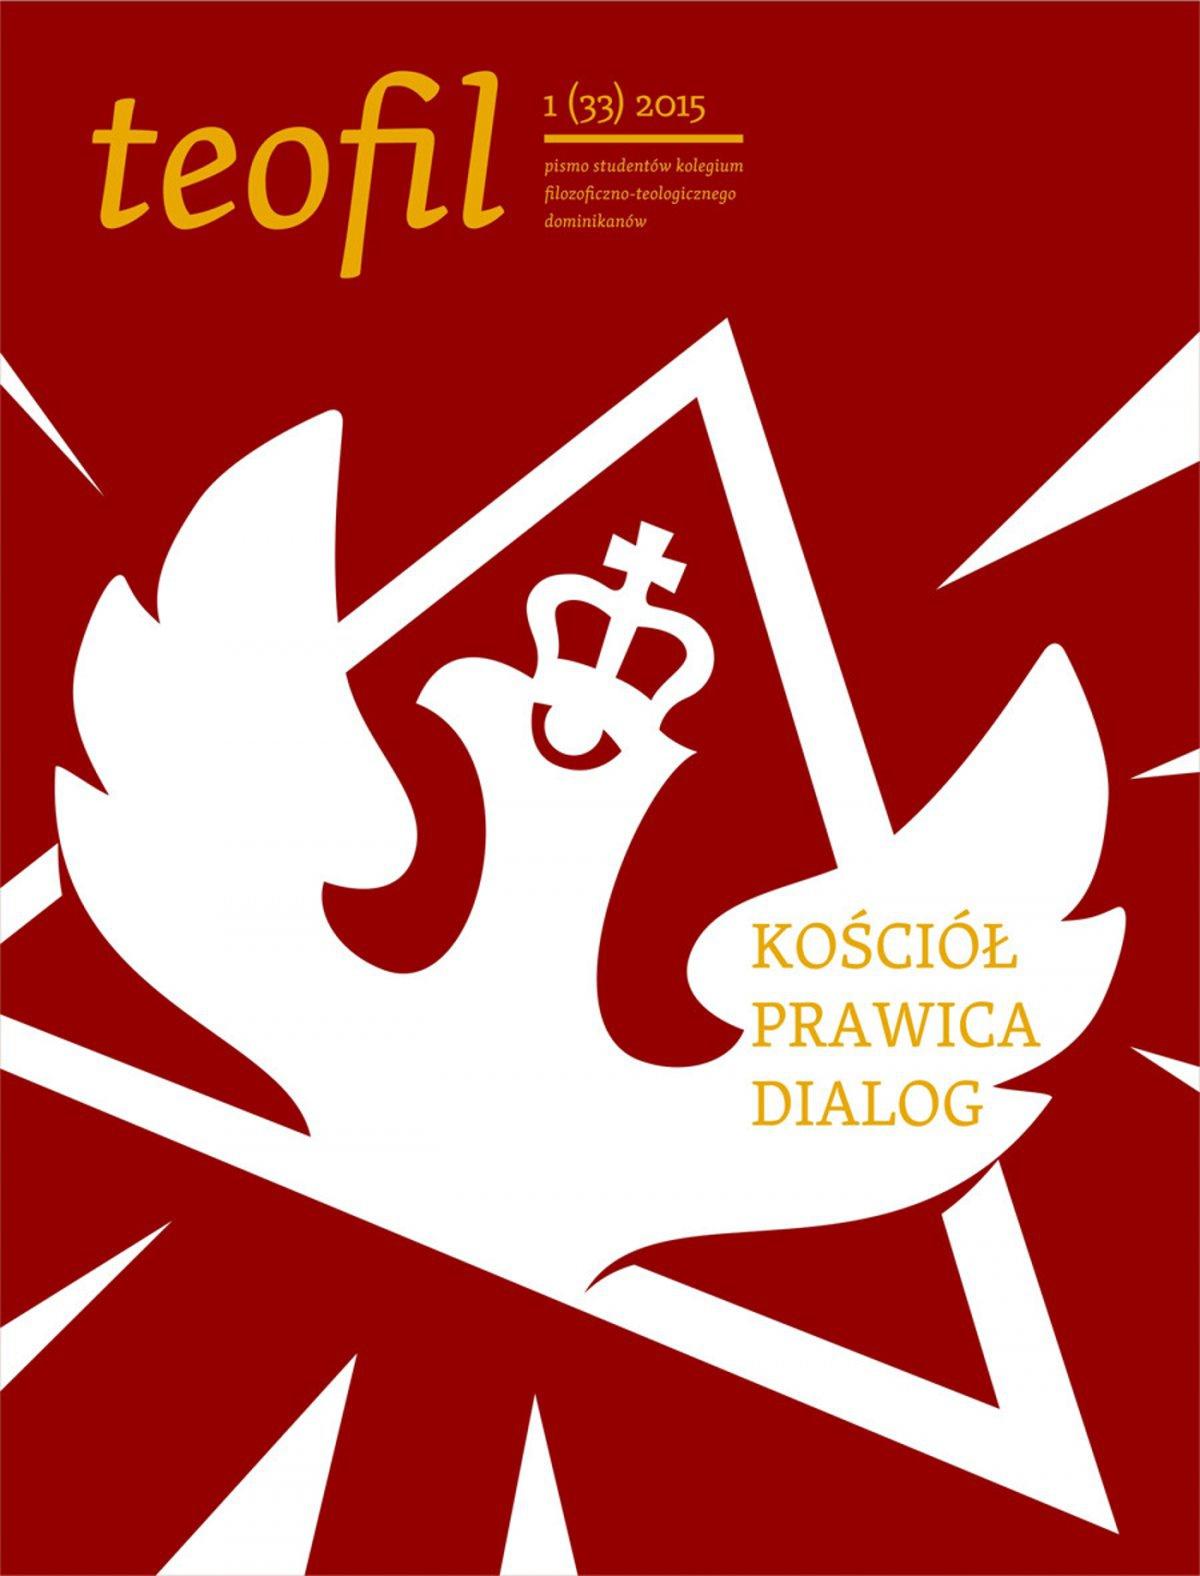 Teofil 1 (33) 2015 Kościół, prawica, dialog - Ebook (Książka EPUB) do pobrania w formacie EPUB